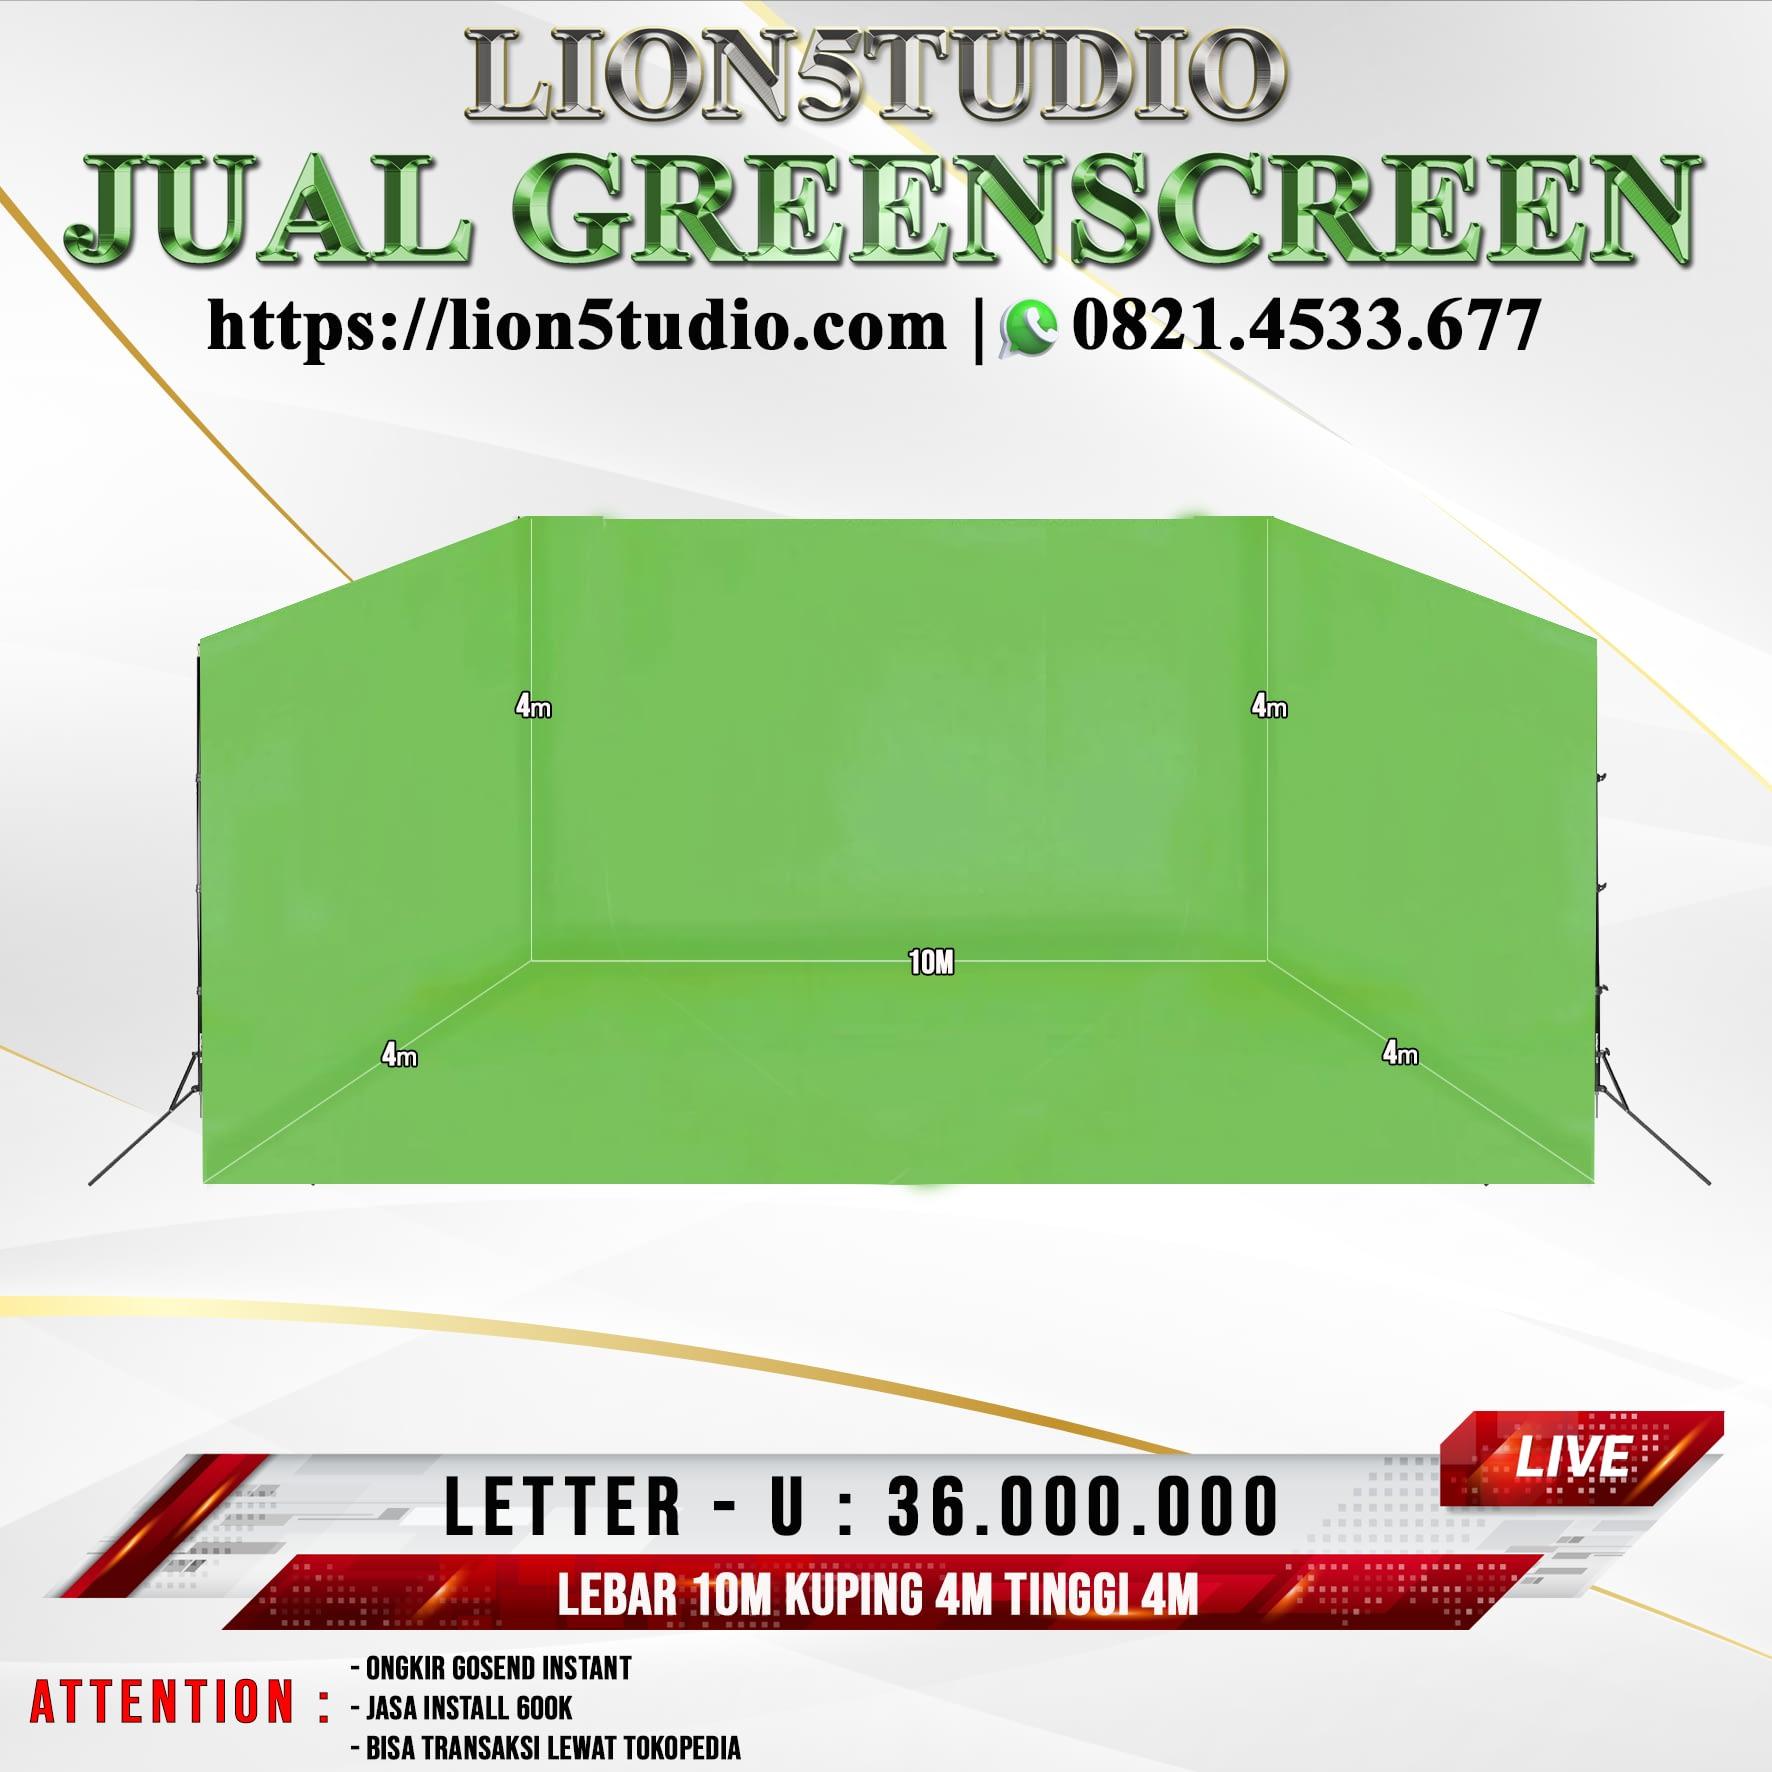 Pricelist Jual Greenscreen Murah Jakarta Bandung